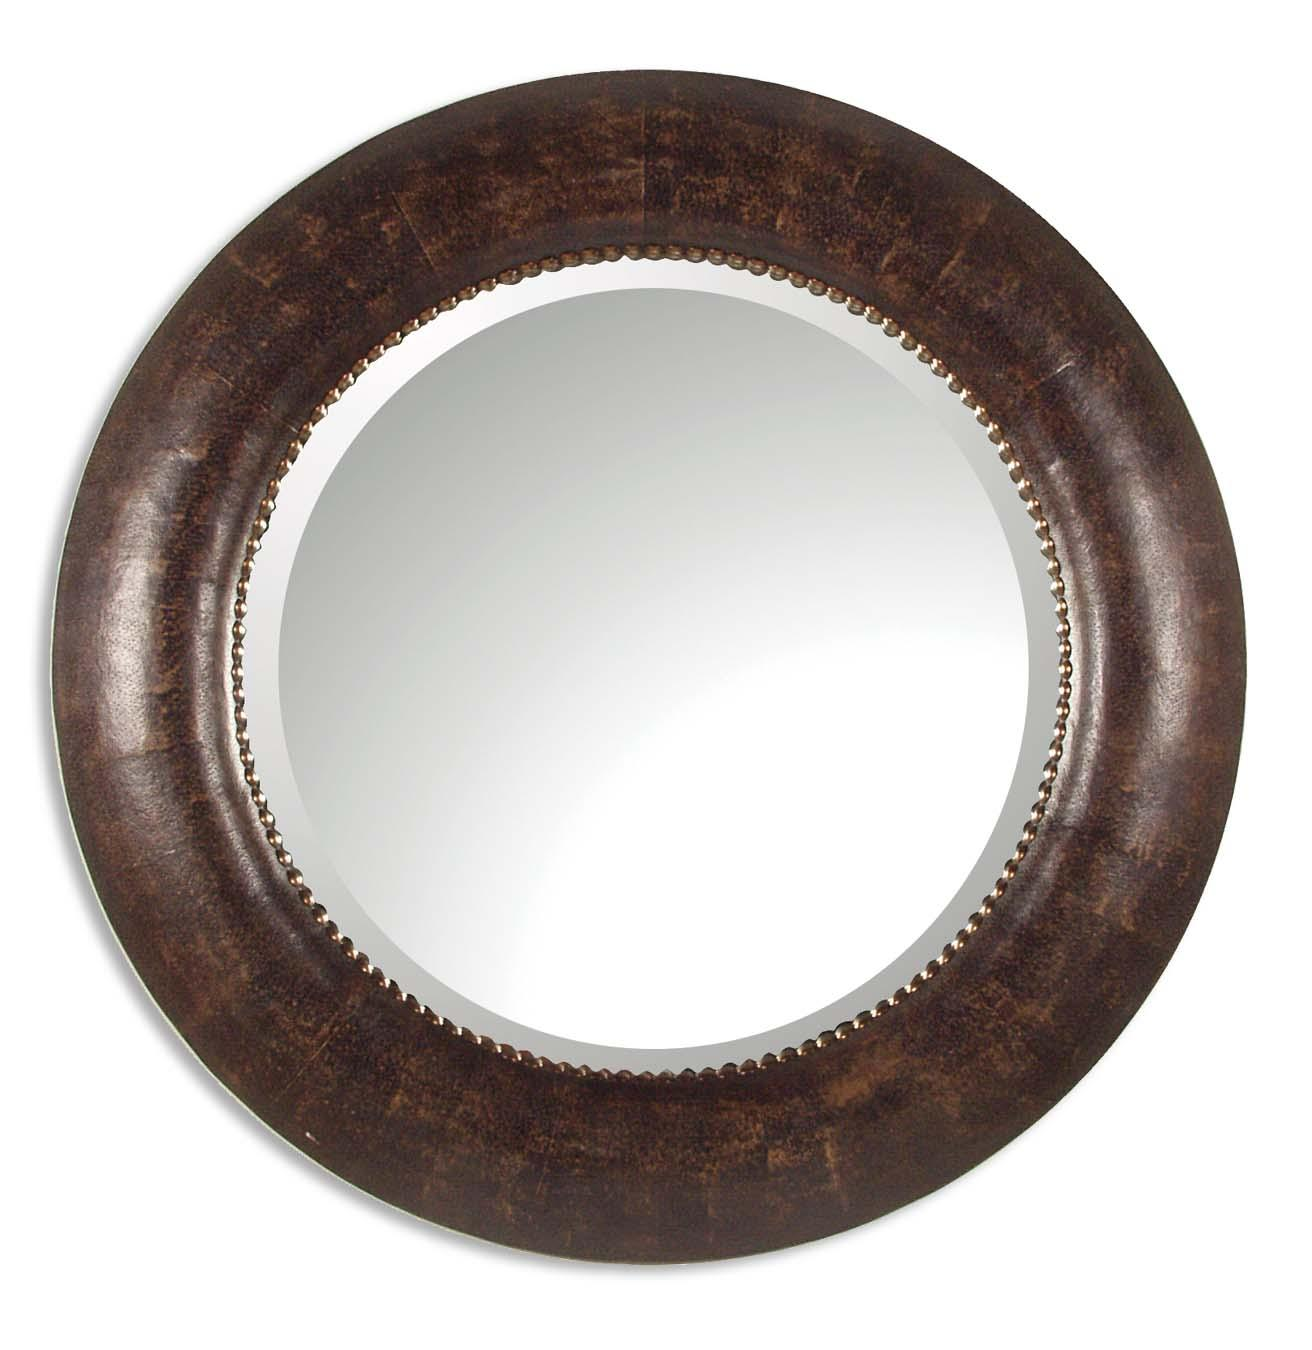 Uttermost Mirrors Leonzio Mirror - Item Number: 07515 B